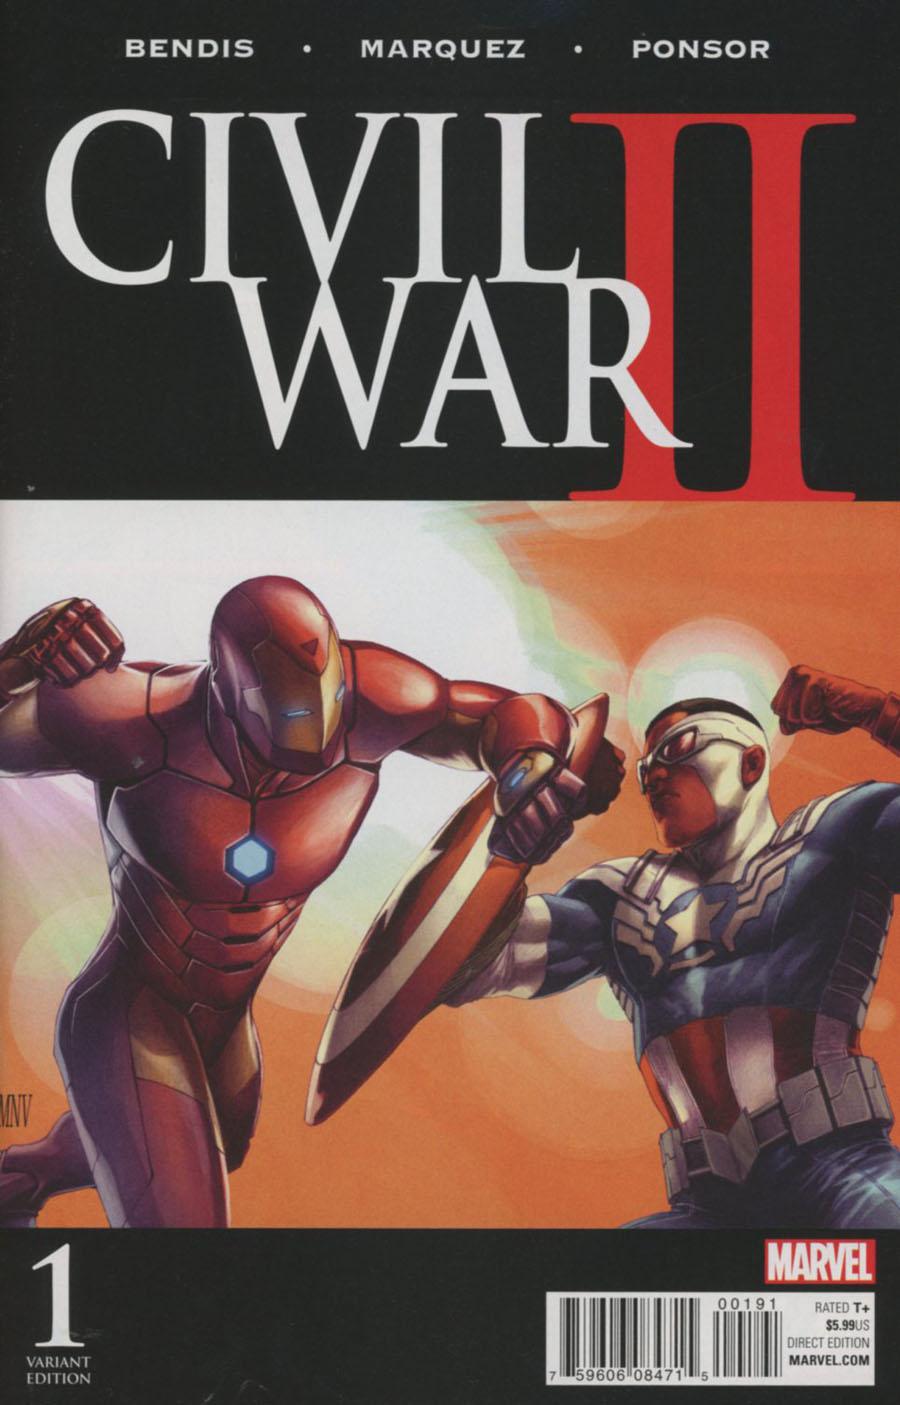 Civil War II #1 Cover N Incentive Steve McNiven Color Variant Cover